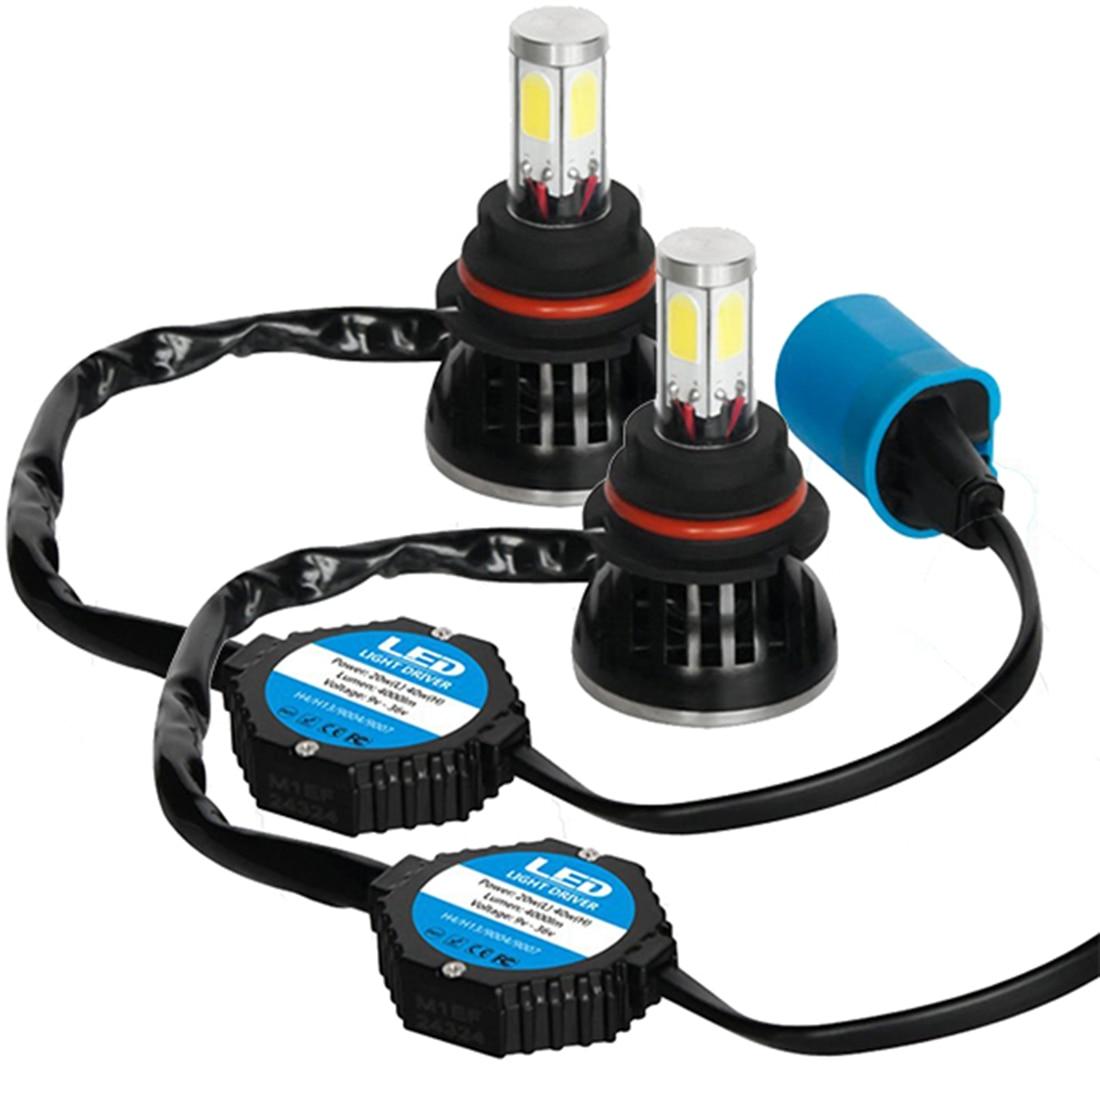 Tonewan Brand New 2pcs 2400LM H3 LED Headlight Bulbs All in one Conversion Kit Cool White Light